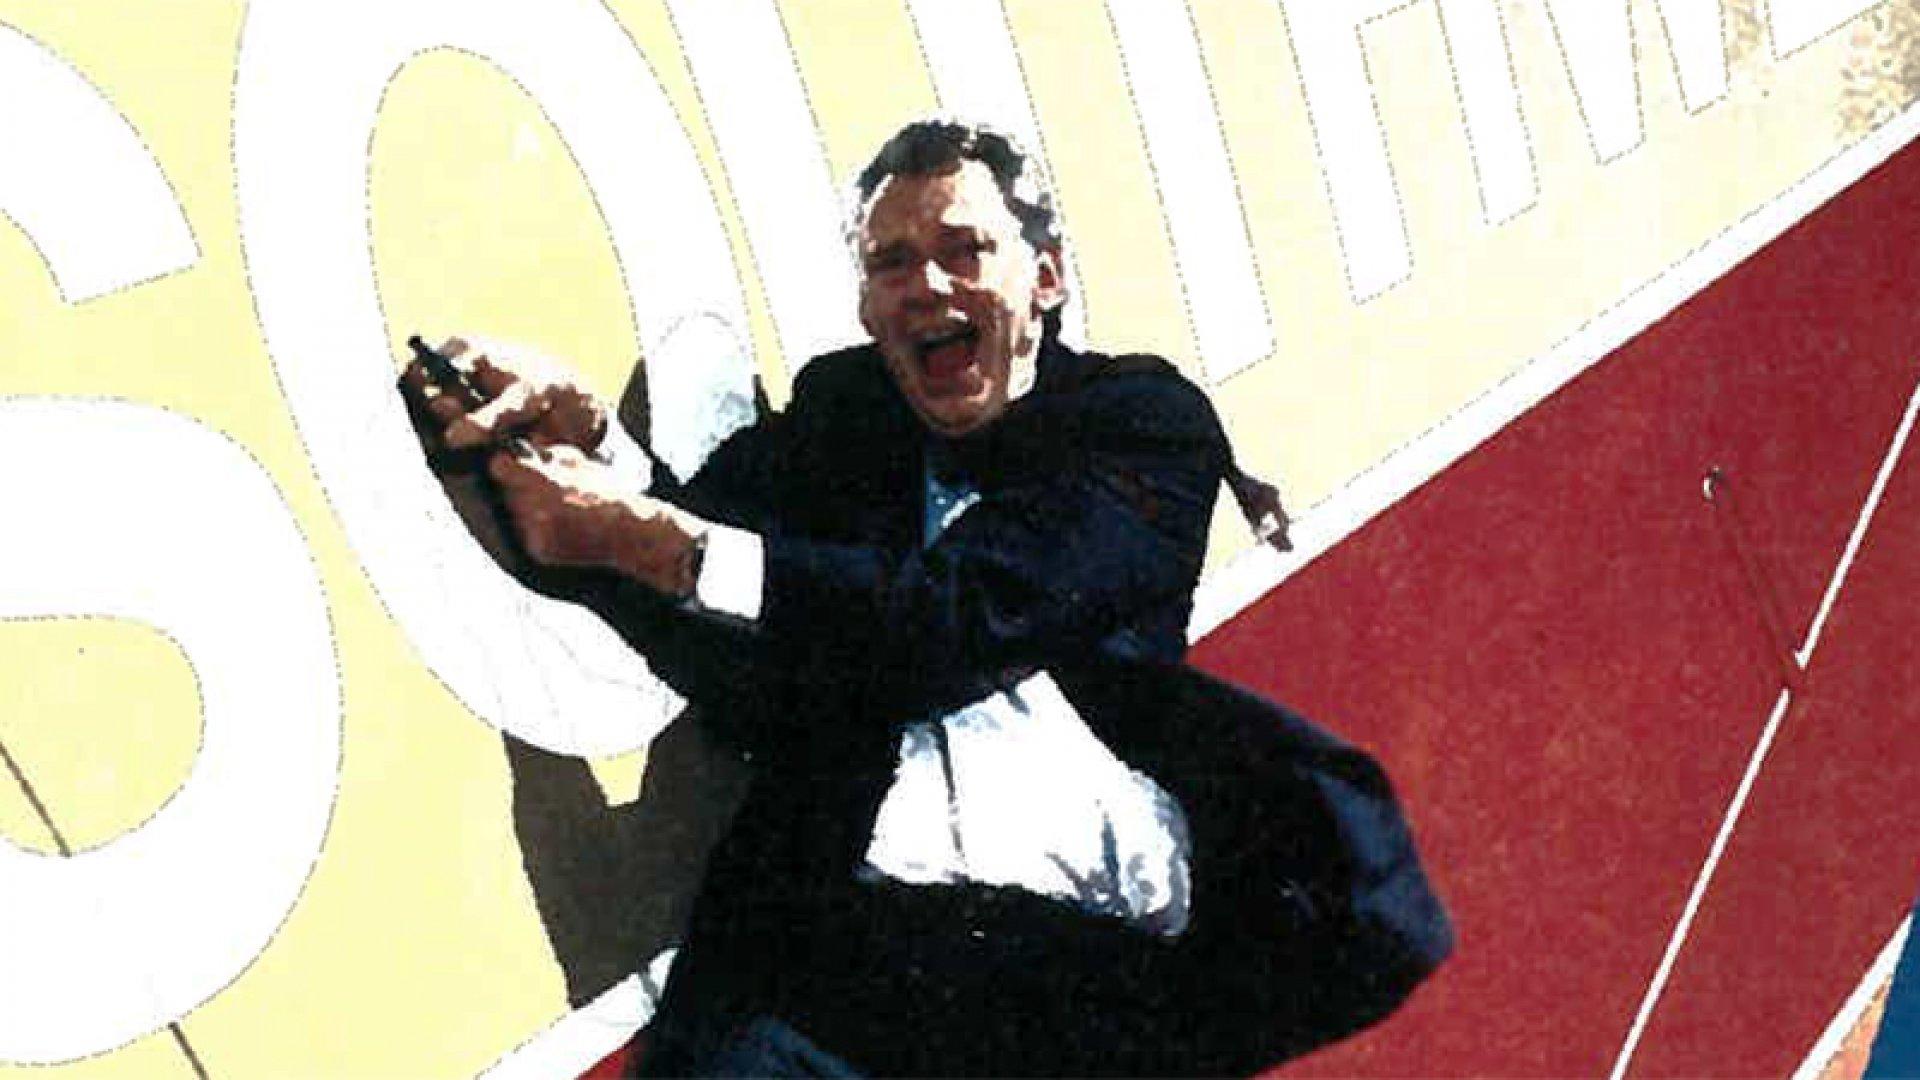 Southwest's Herb Kelleher: Have Fun, Make Money (1998 Interview)